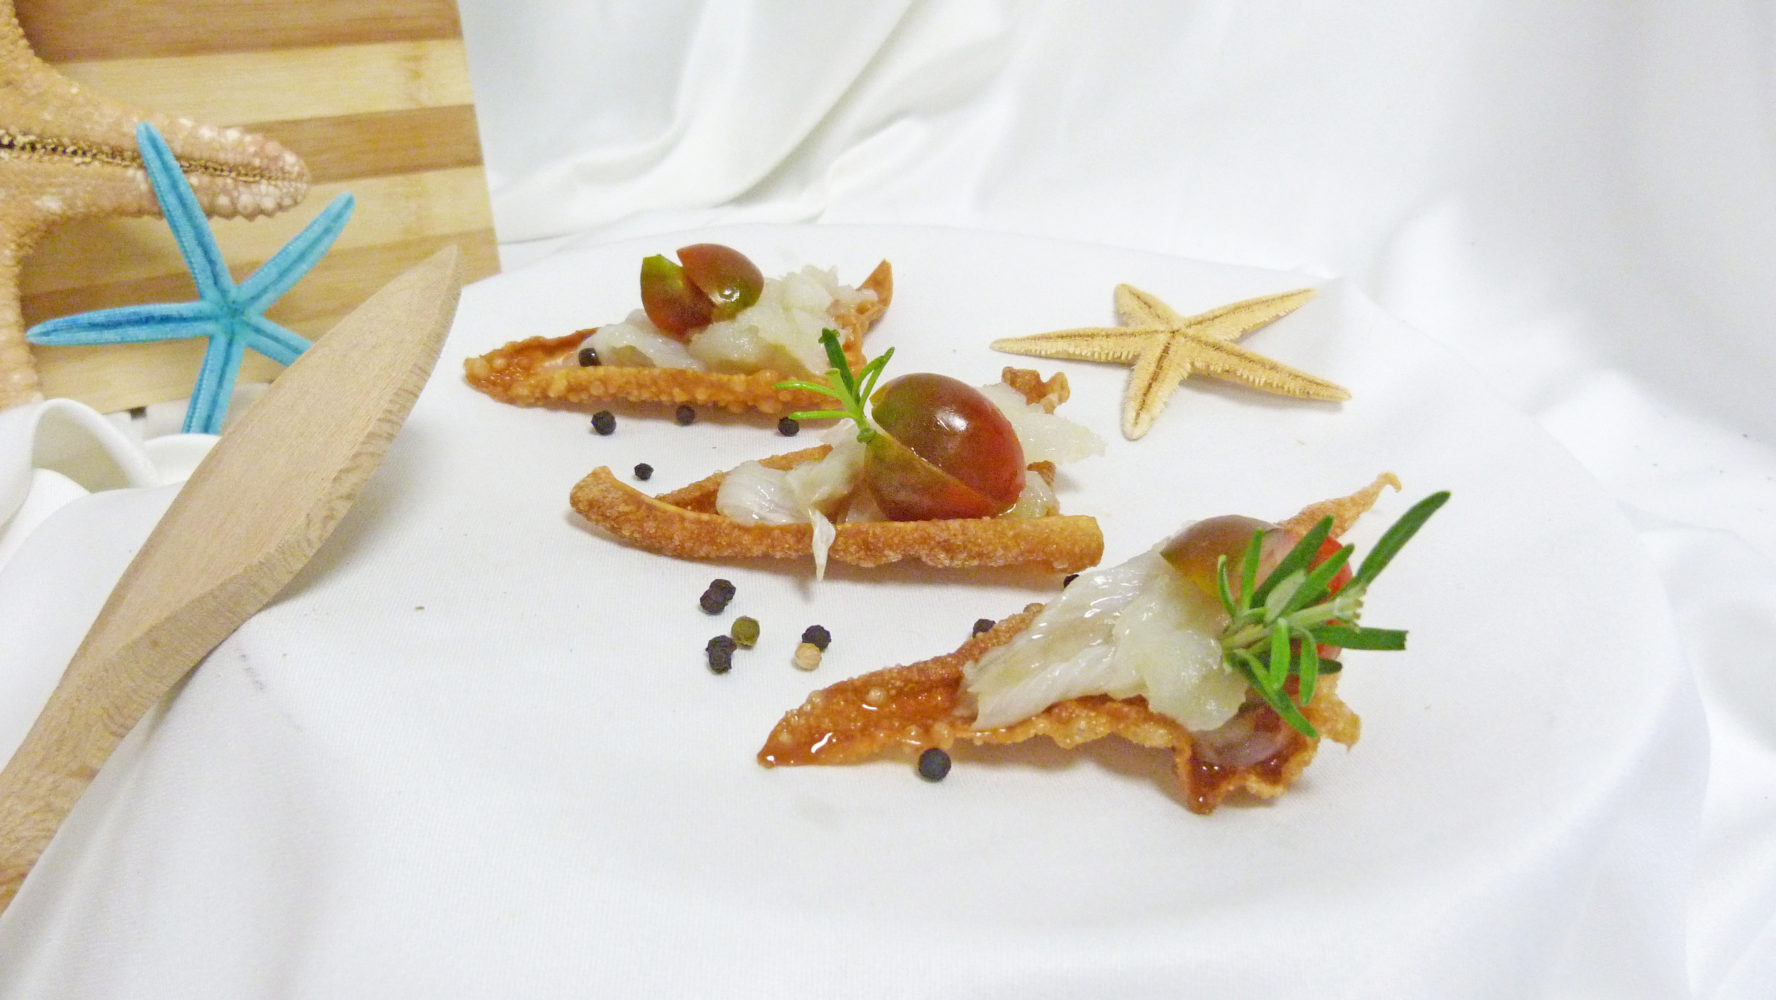 Tramezzinis de bacalao al toque de olivada